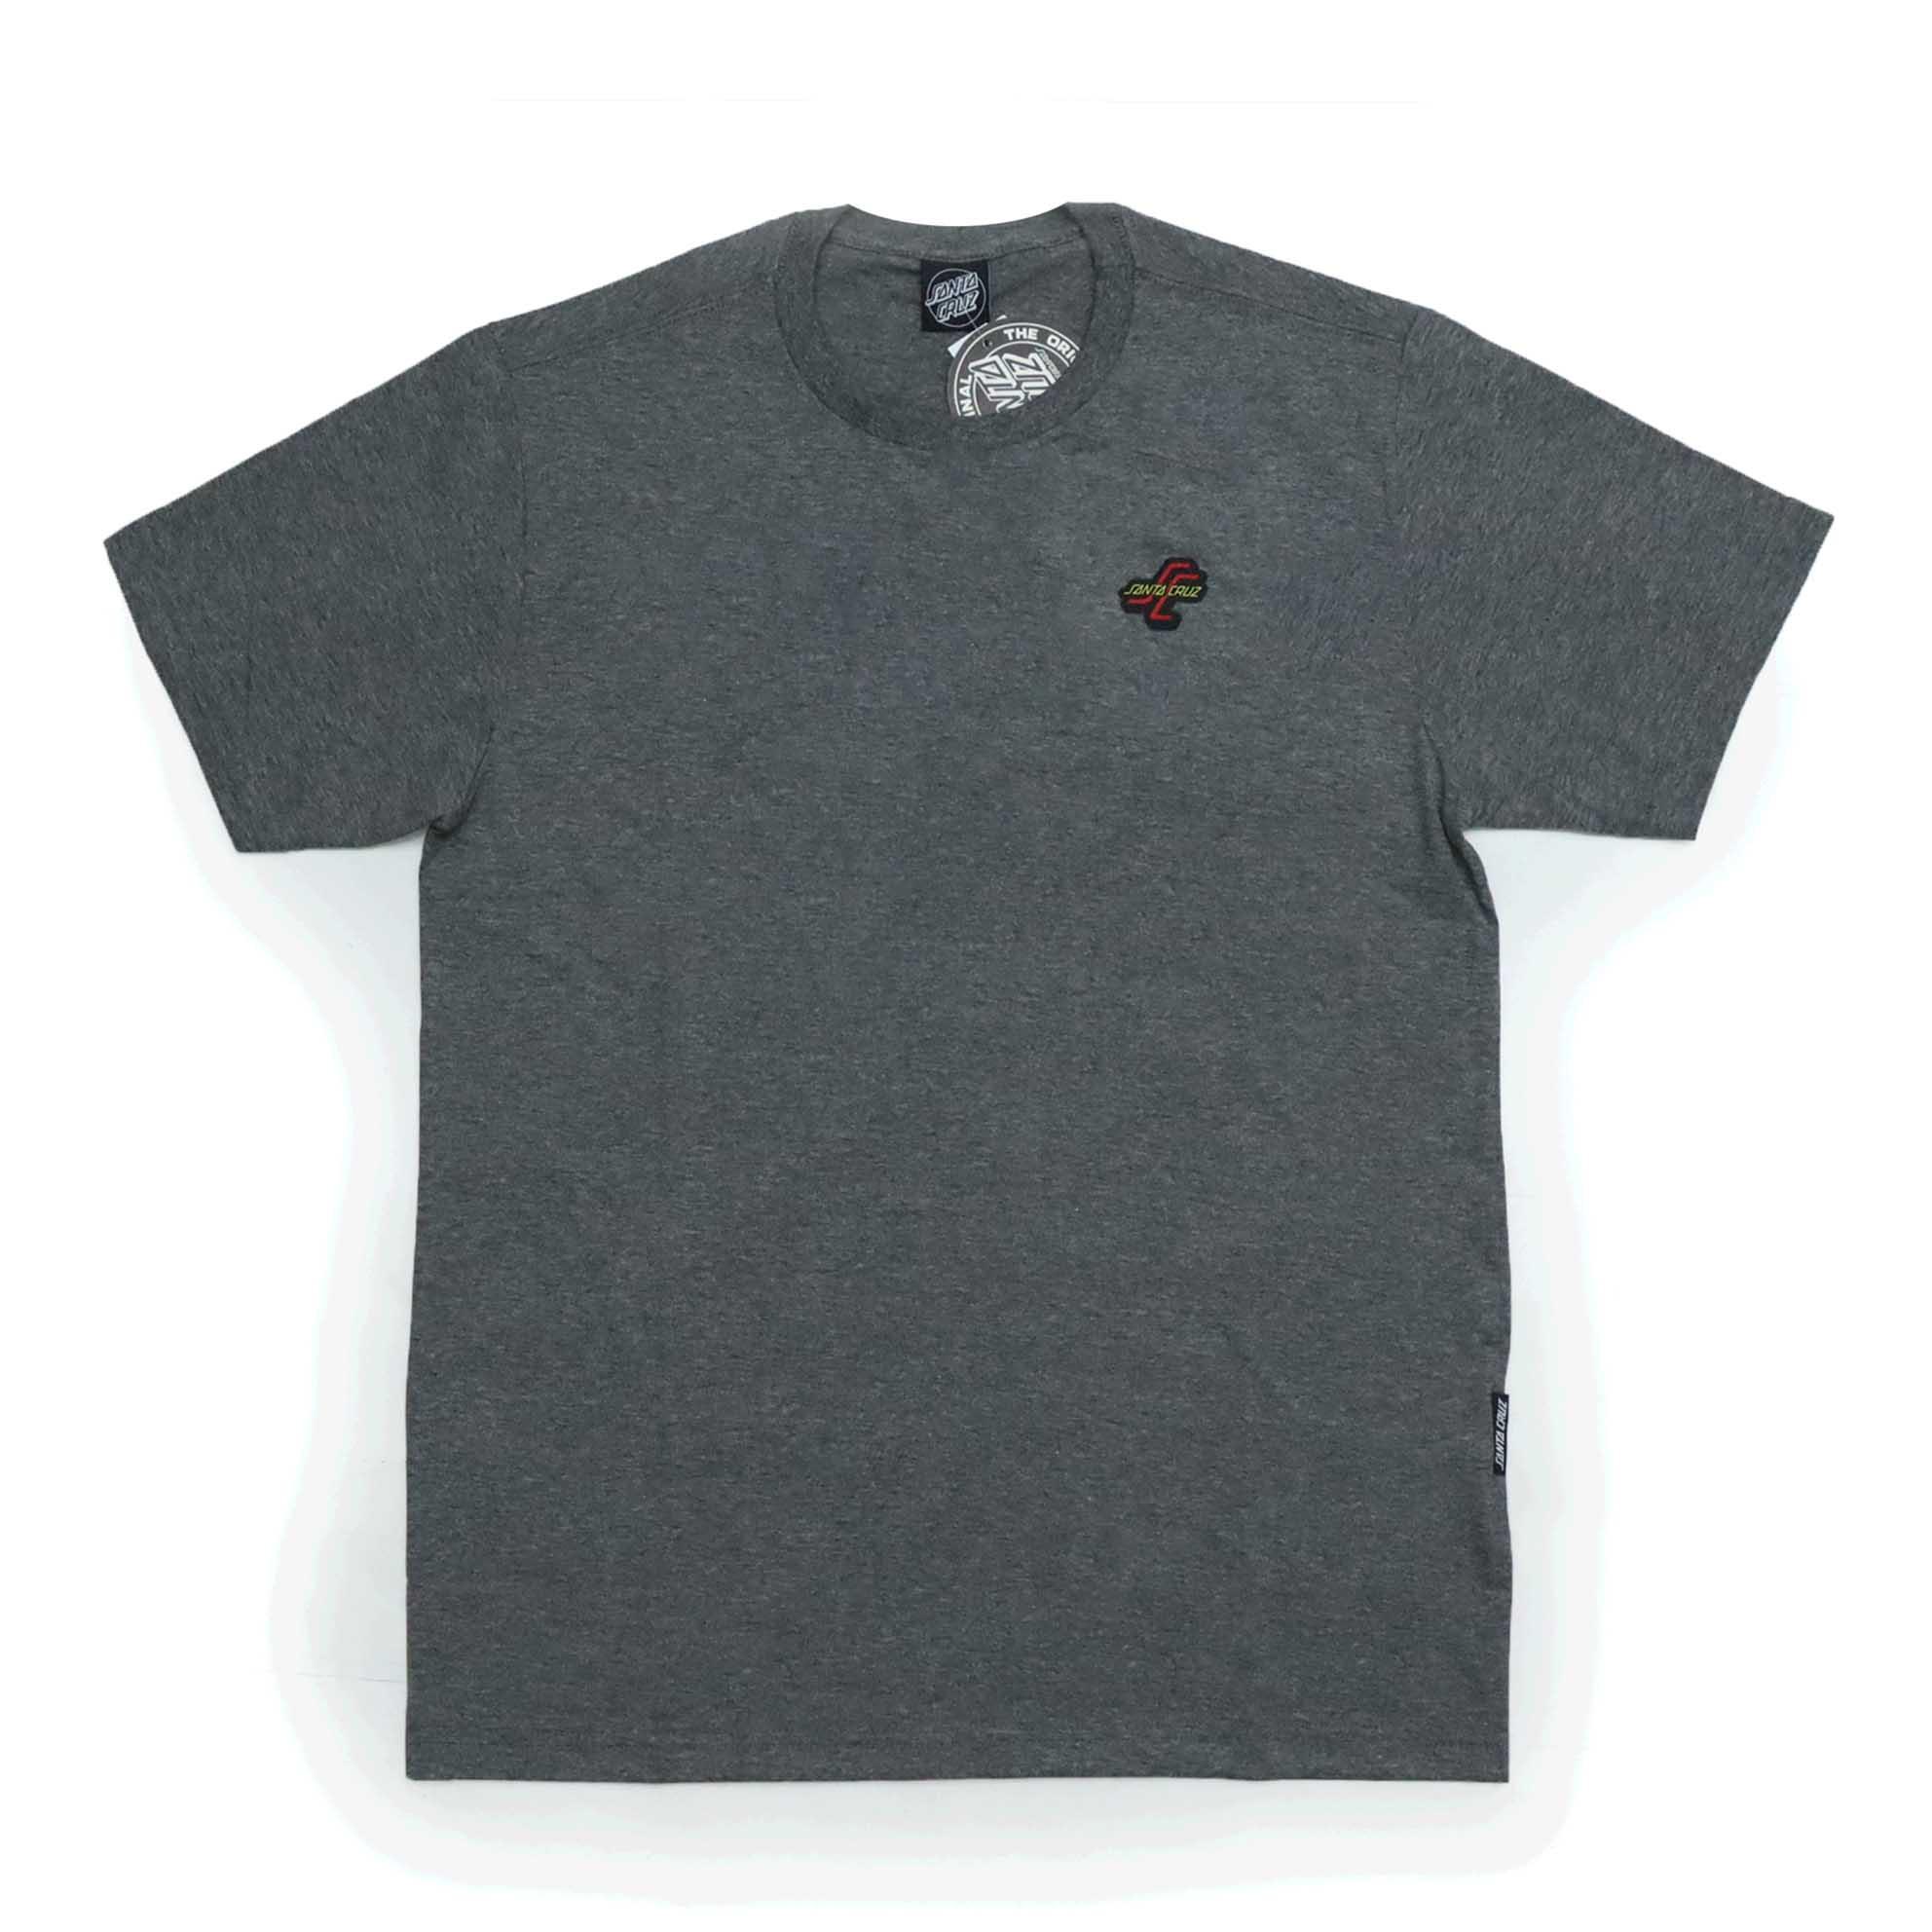 Camiseta Santa Cruz O.G.S.C Chest - Chumbo Mescla